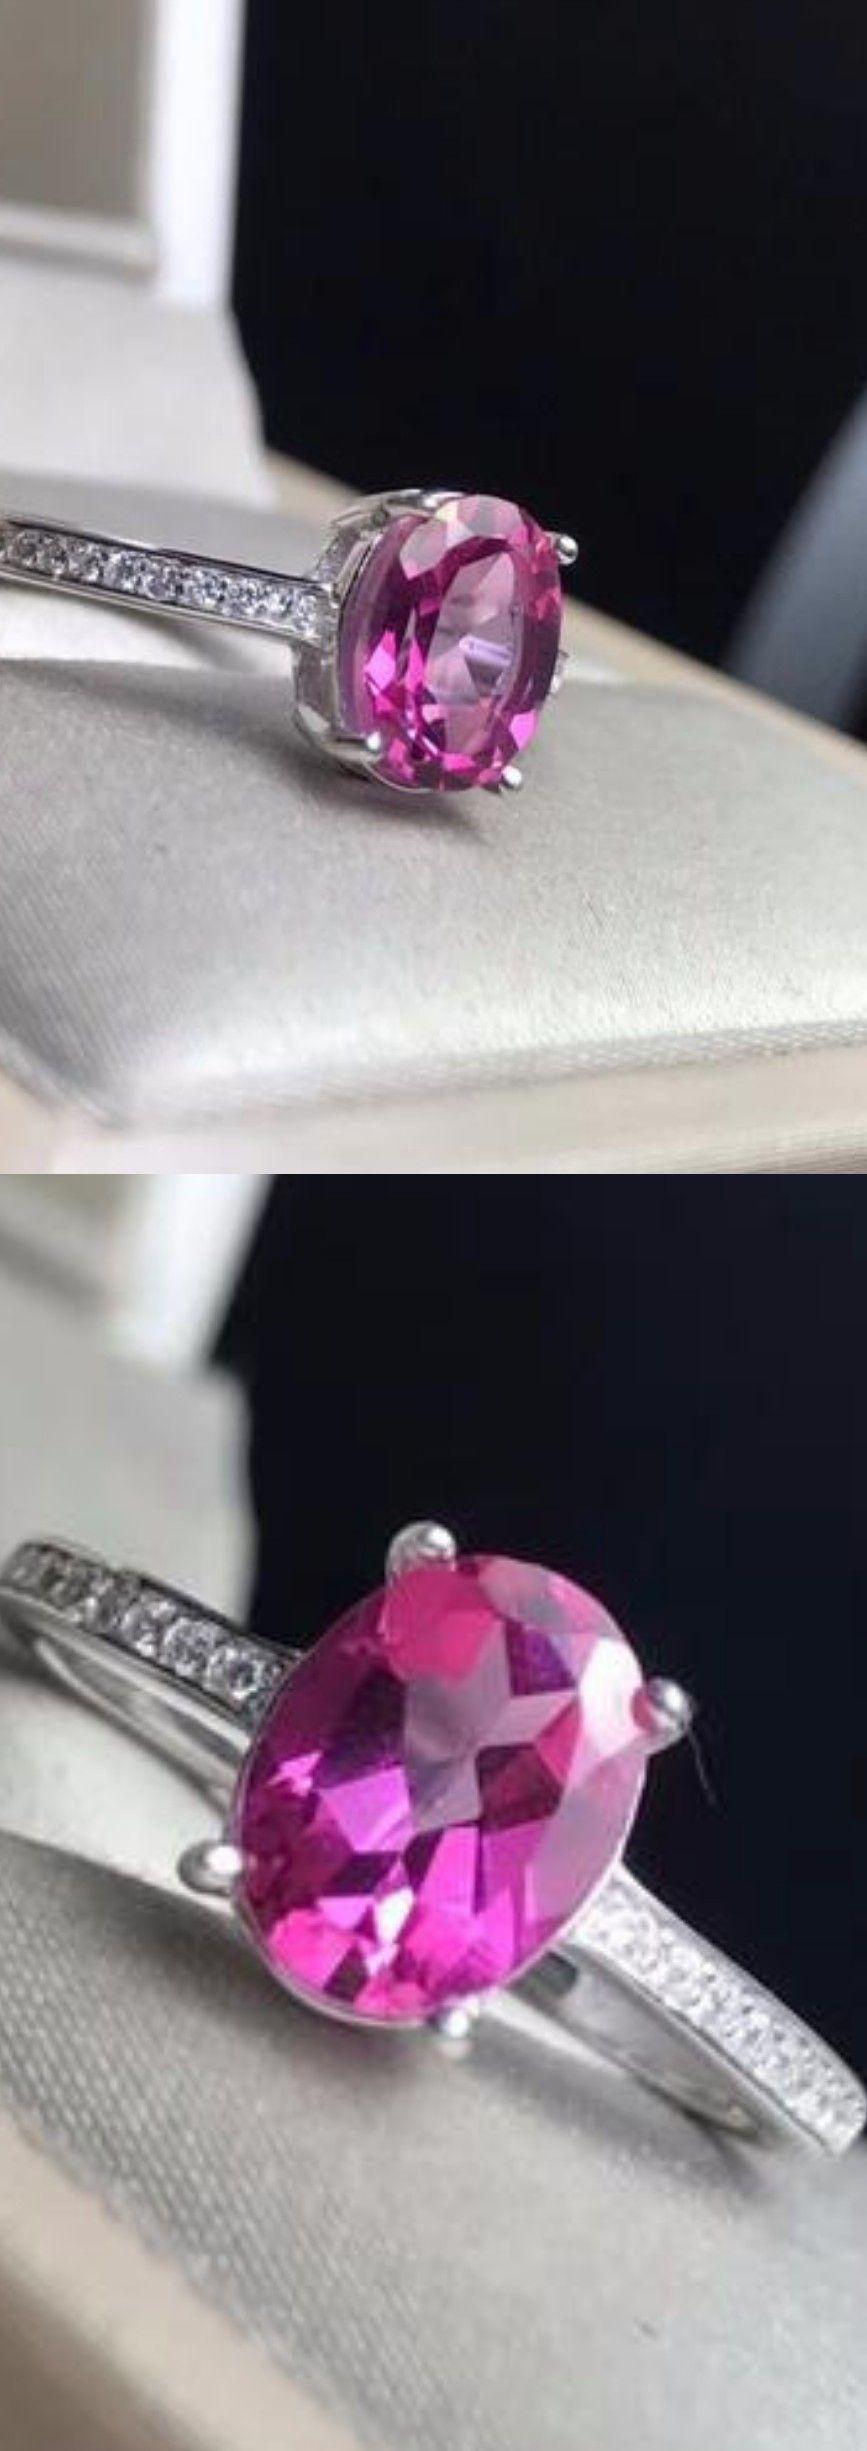 Weddng Jewelry Square Natural Pink Topaz Gemstone Silver Femme Collier Pendentifs